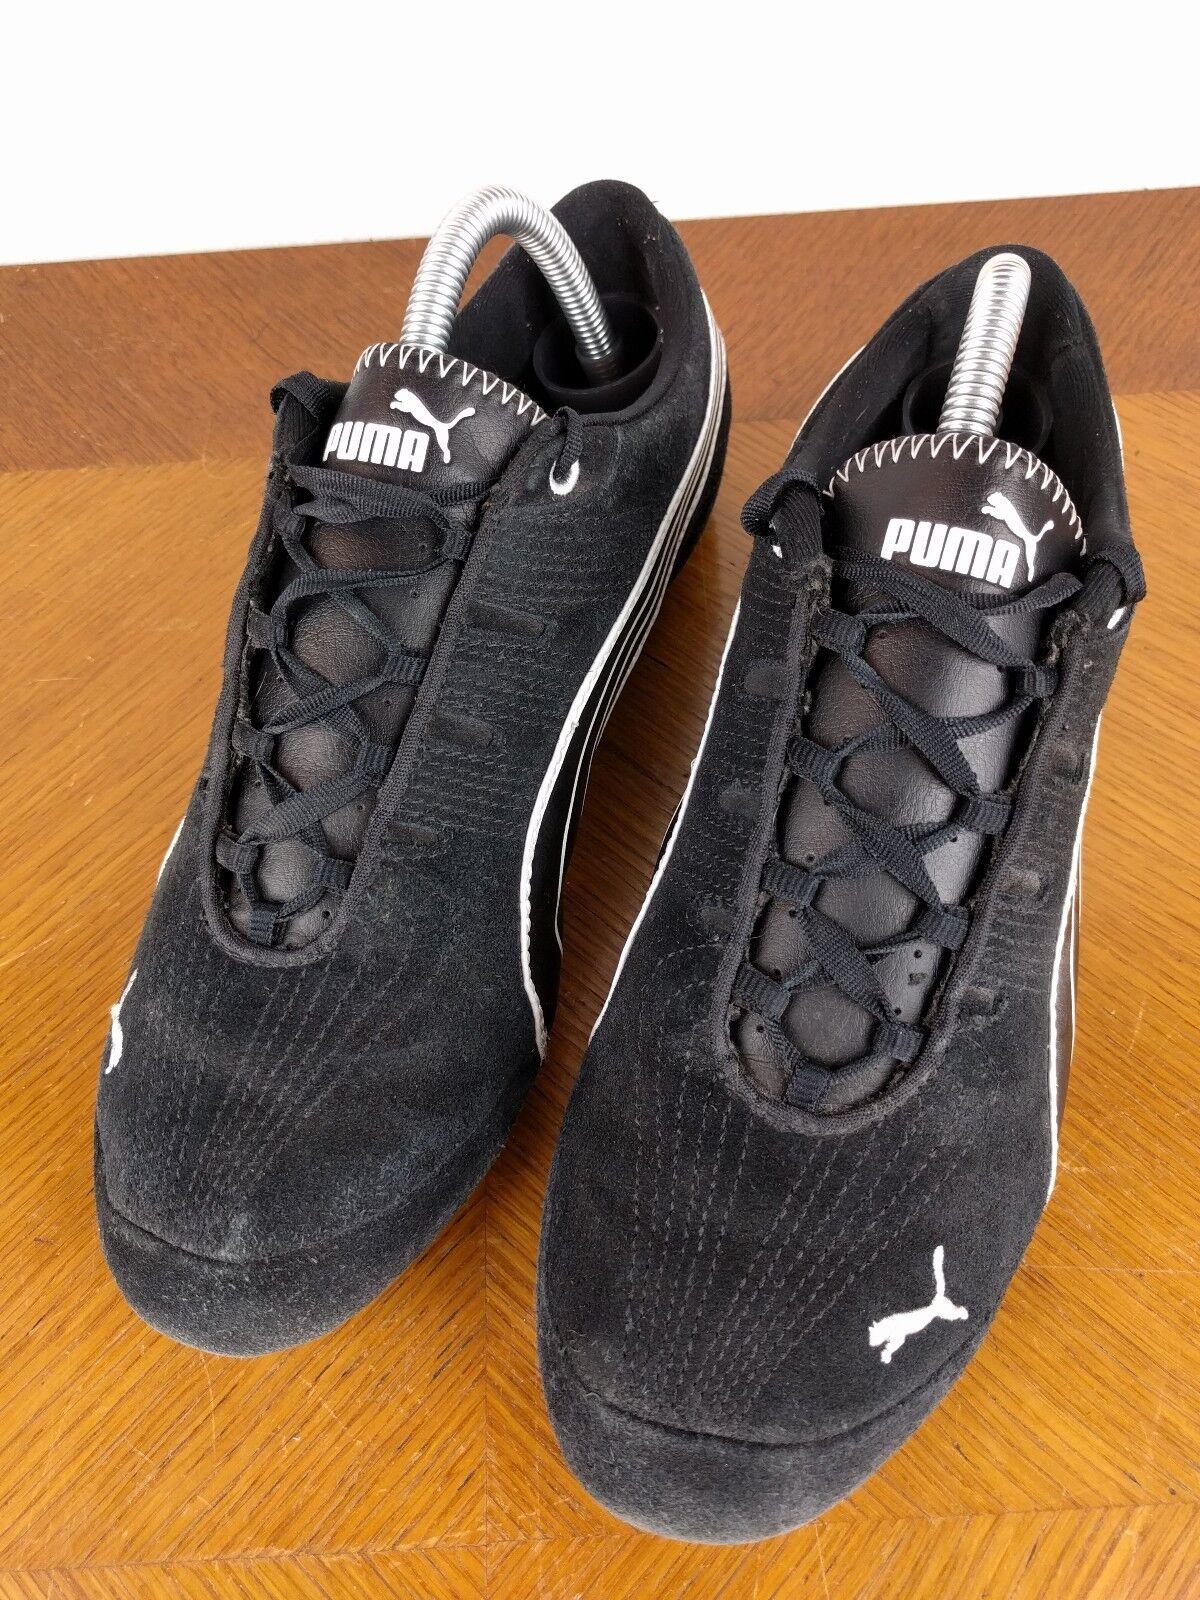 Puma Black Sport Suede Lace Up Shoes Size Sport Black Lifestyle Athletic Sneakers a5d09e